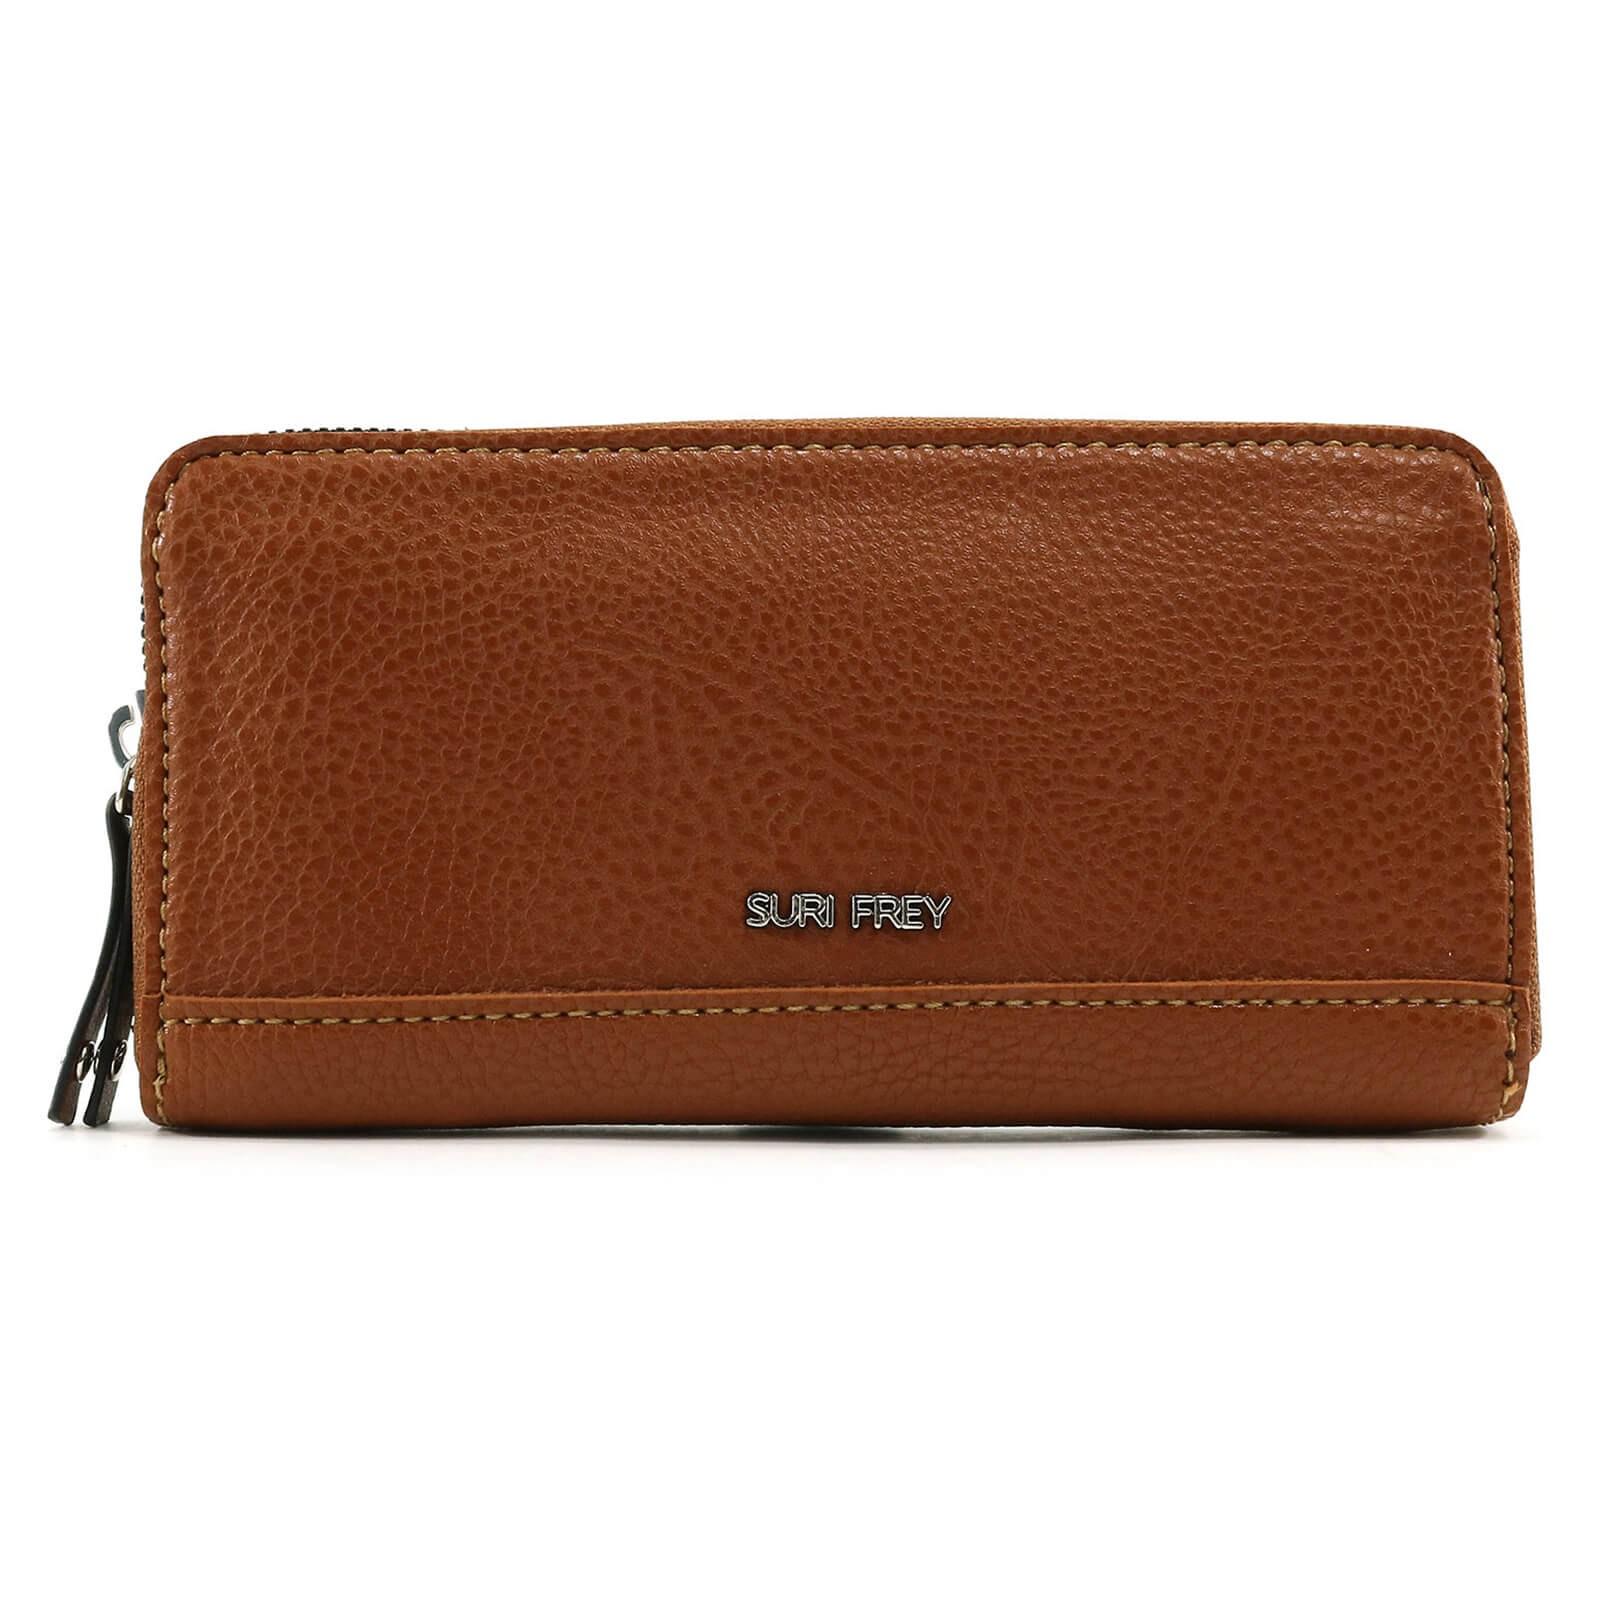 Dámska peňaženka Suri Frey Lorta - hnedá